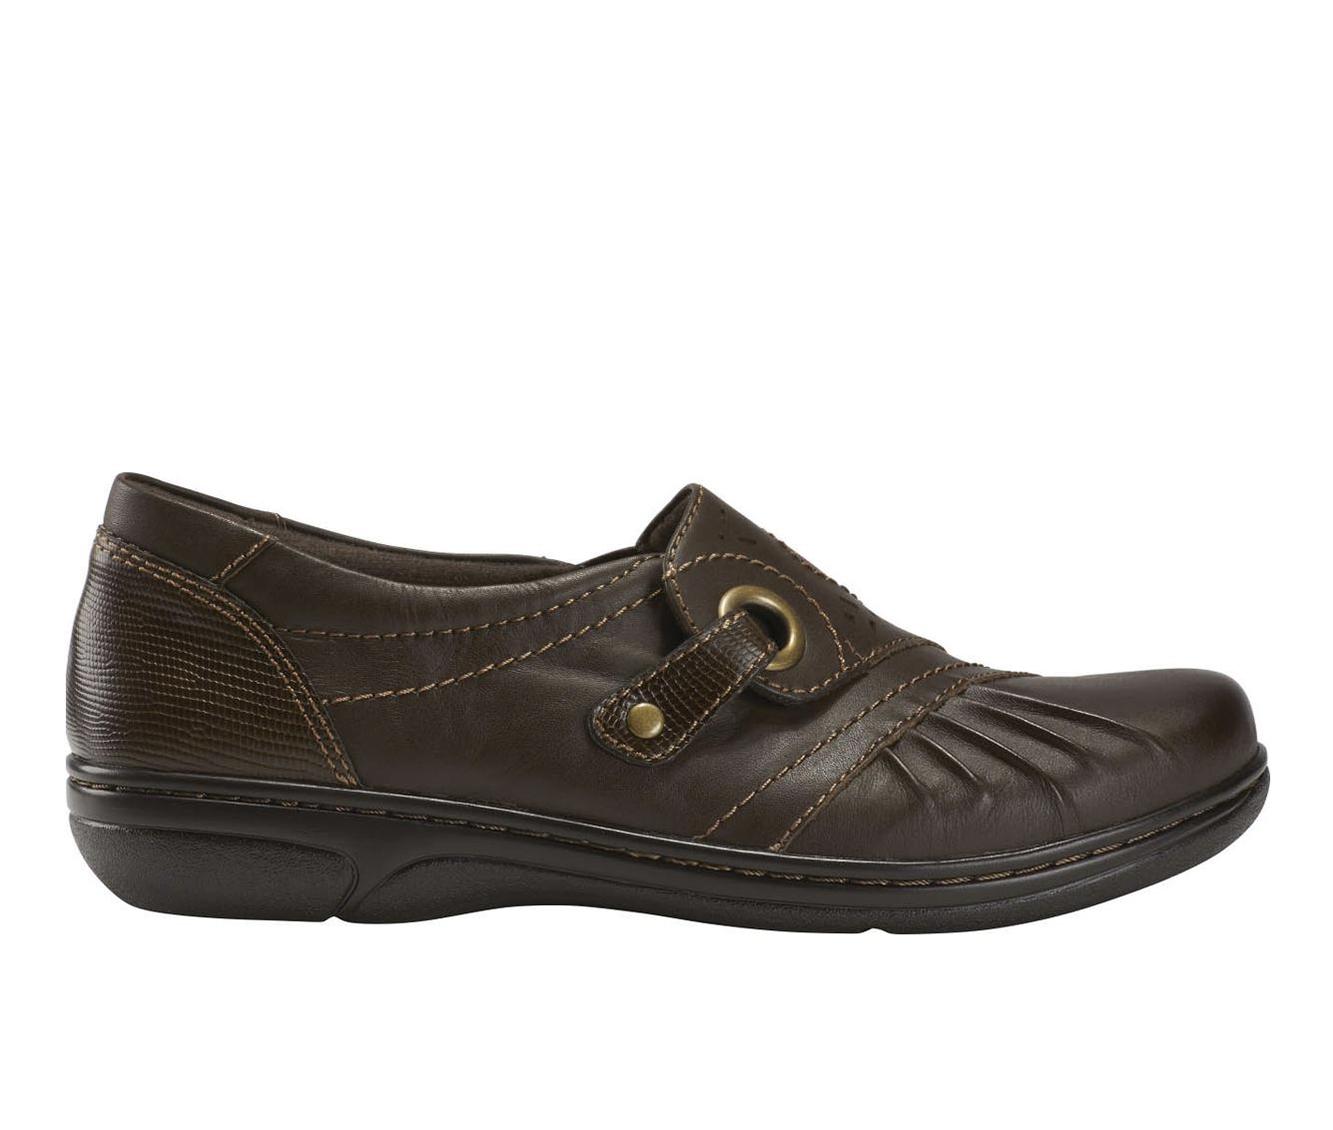 Earth Origins Glendale Gabrielle Women's Shoe (Brown Leather)